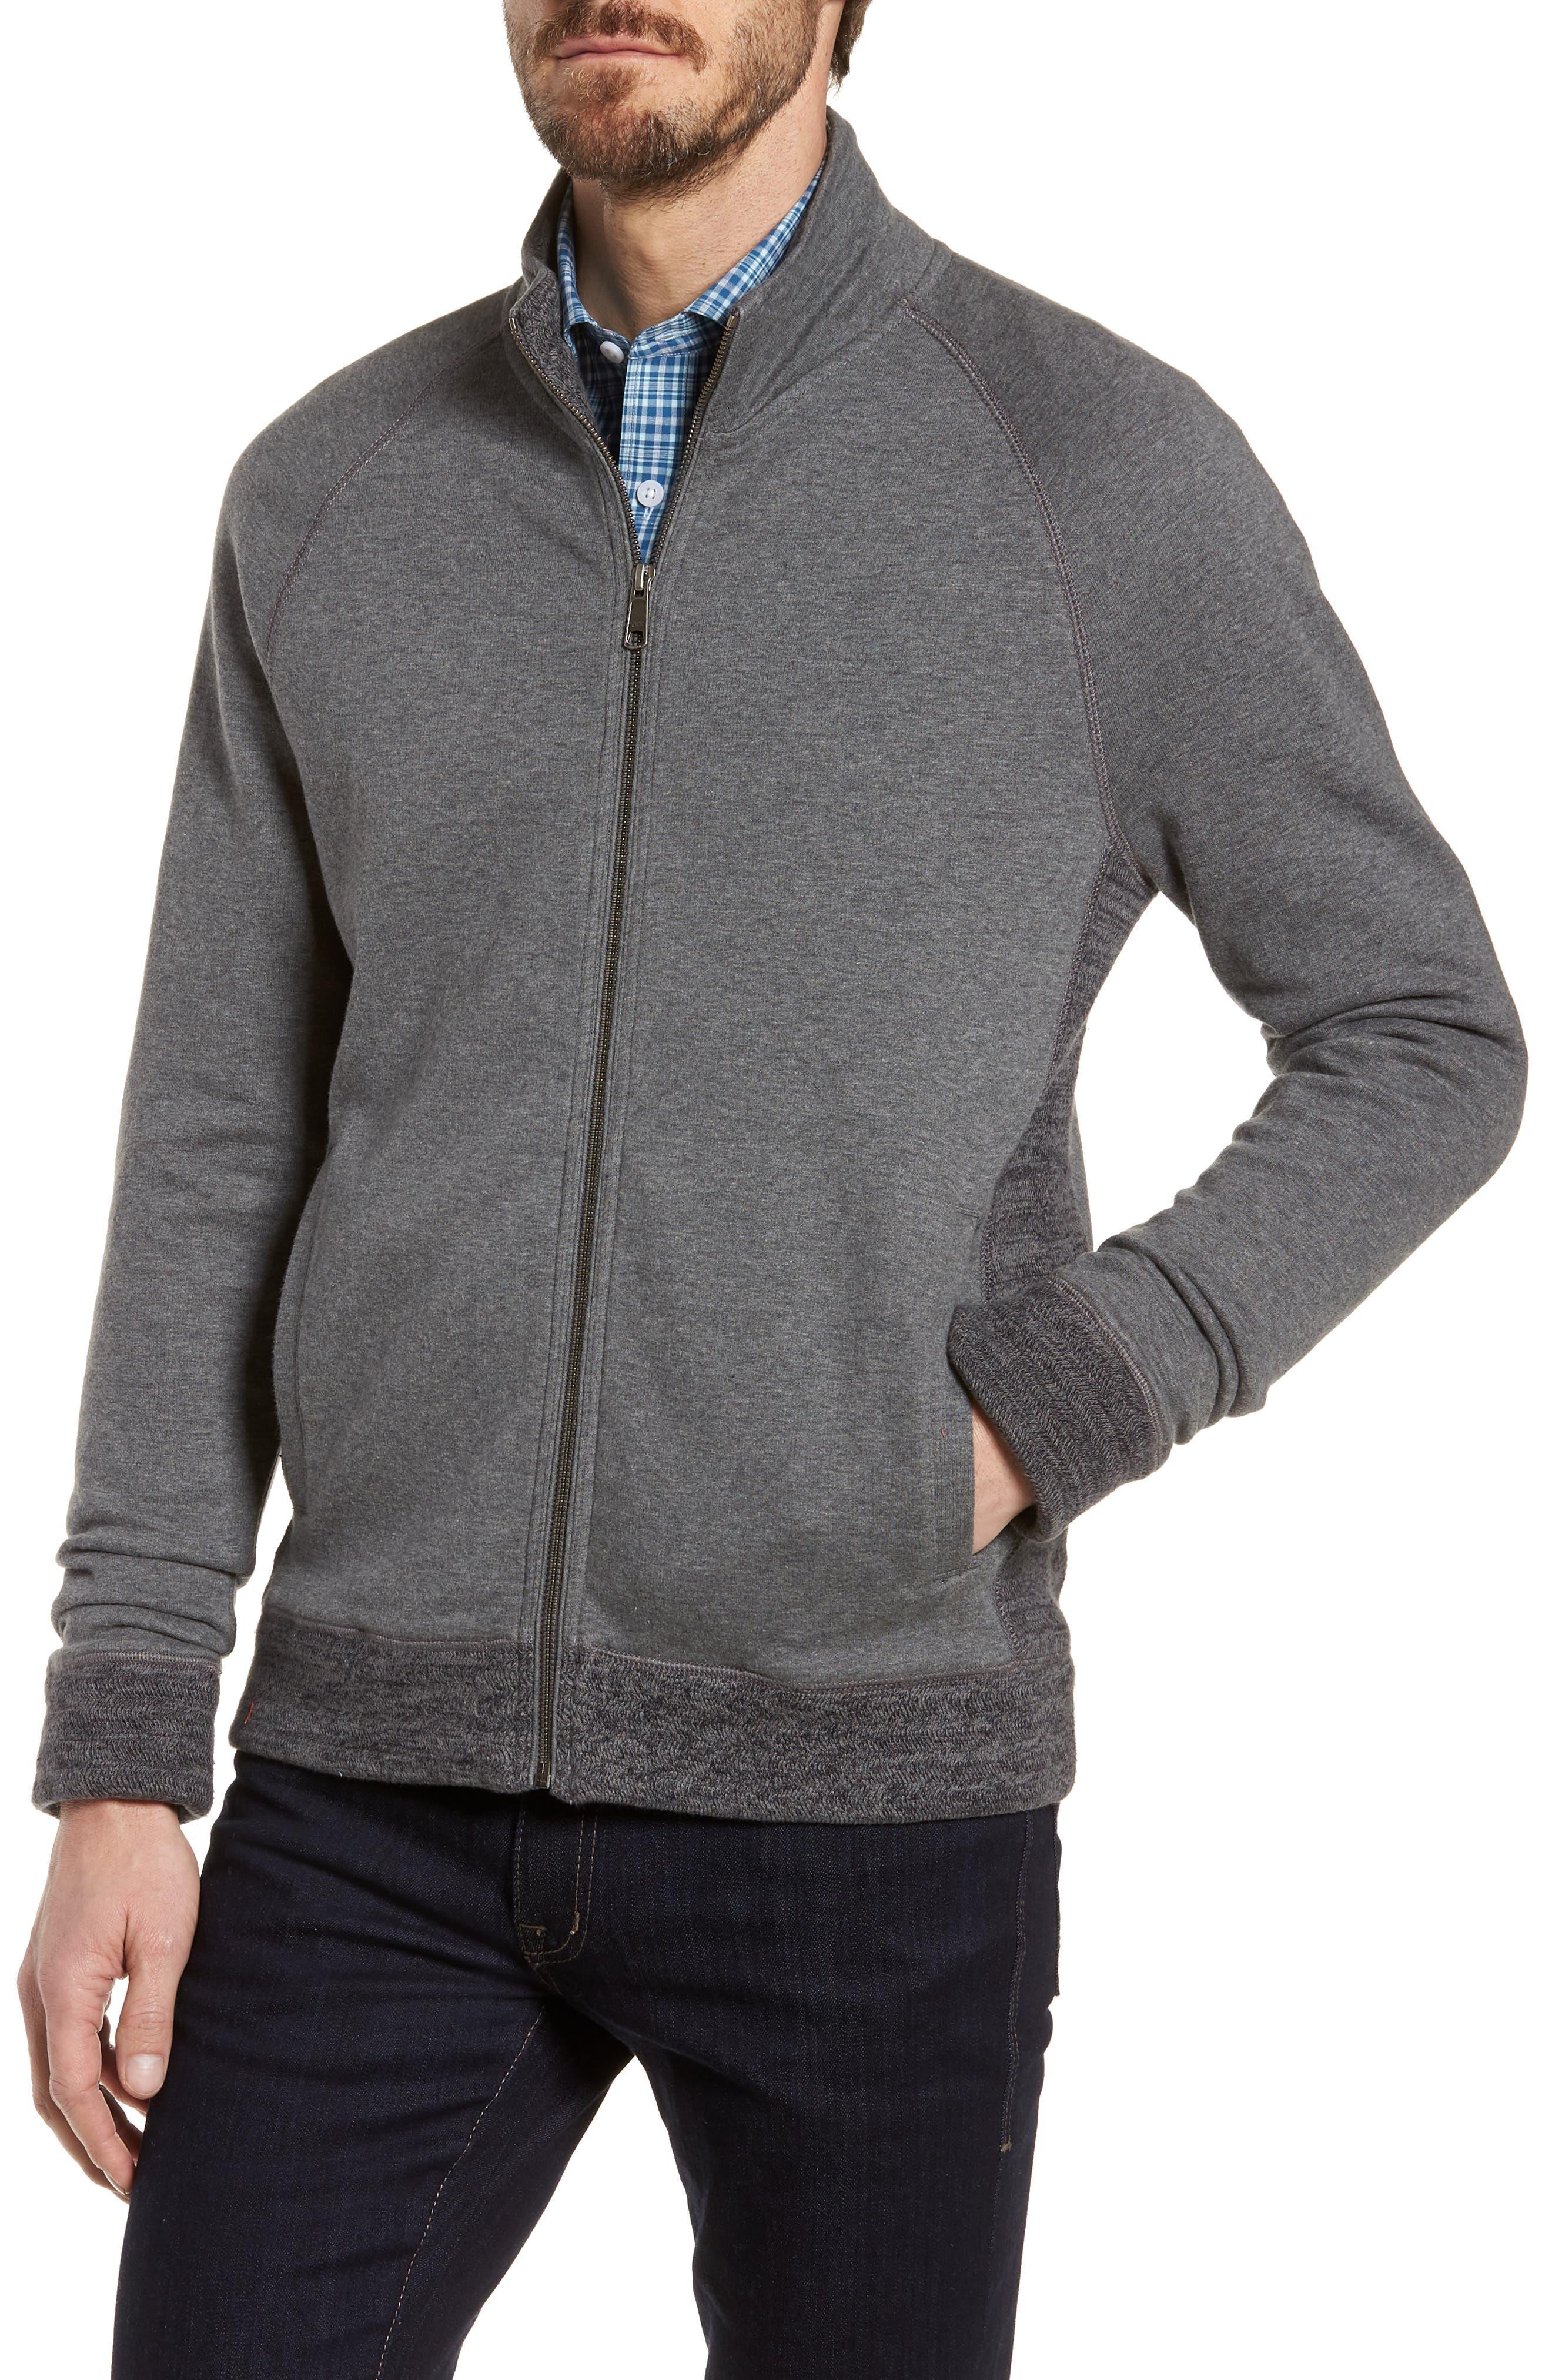 Full Zip Fleece Jacket,                             Alternate thumbnail 4, color,                             Charcoal Heather